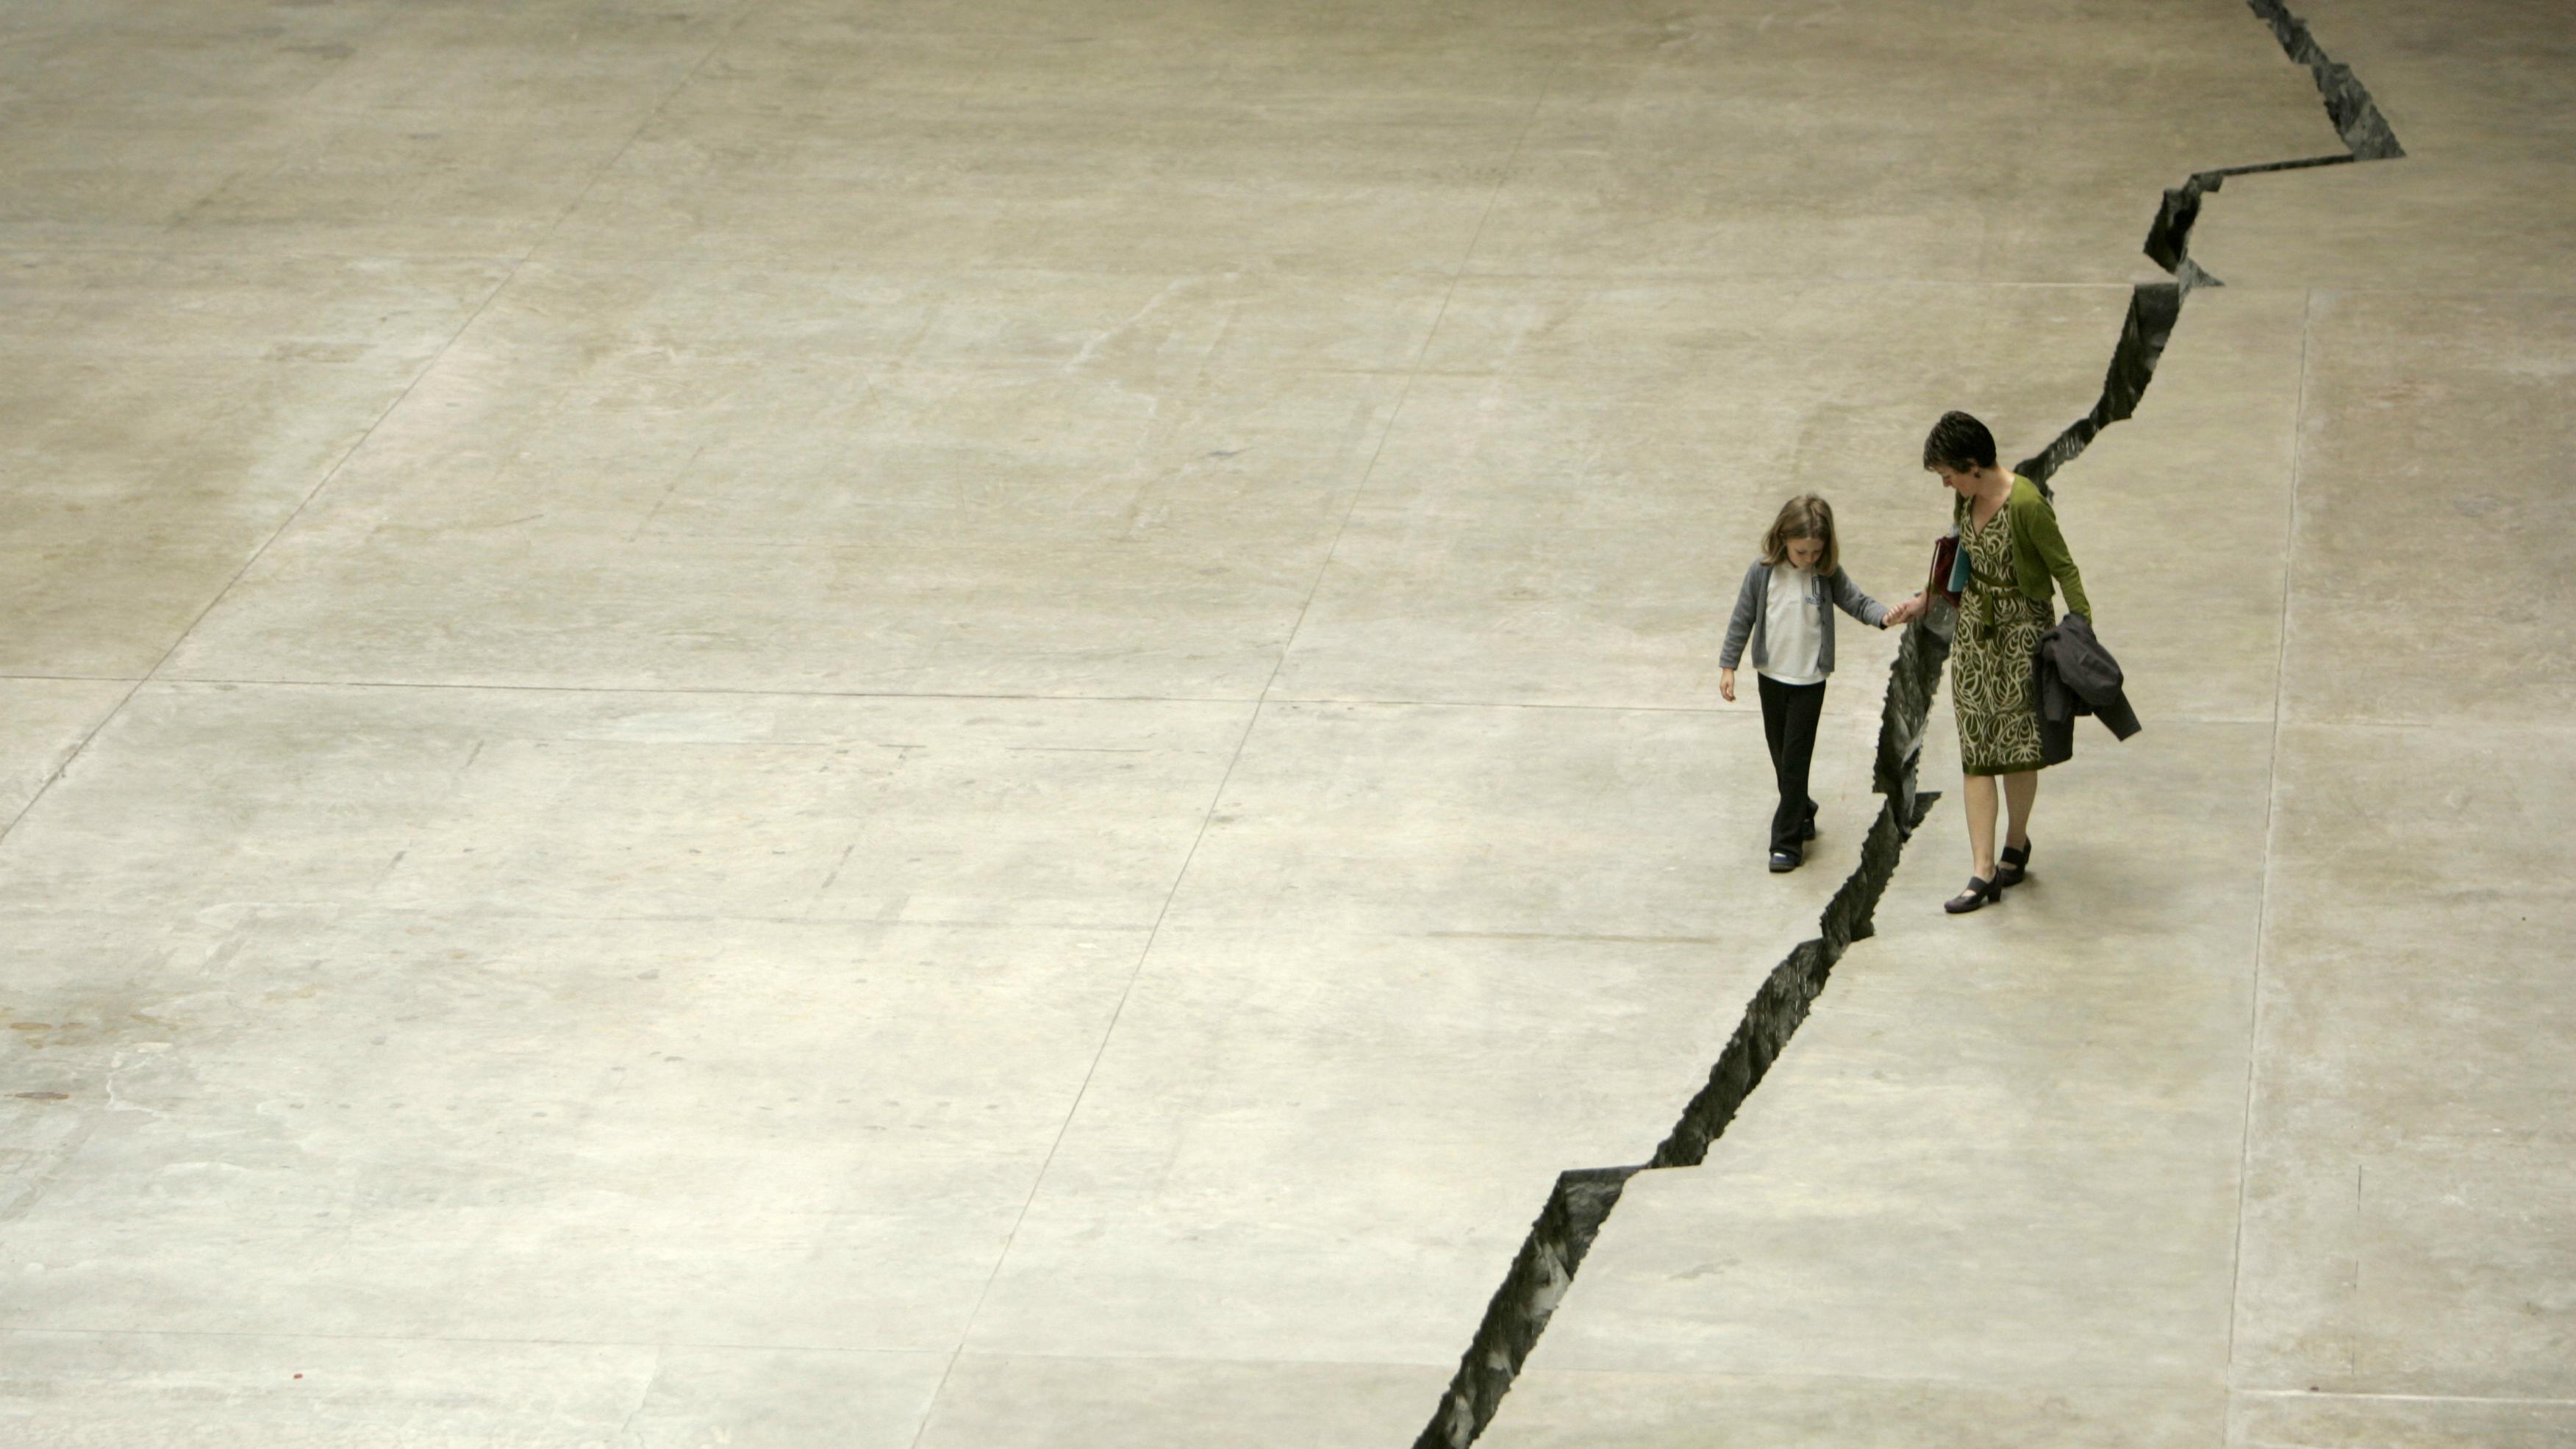 A cracked floor.